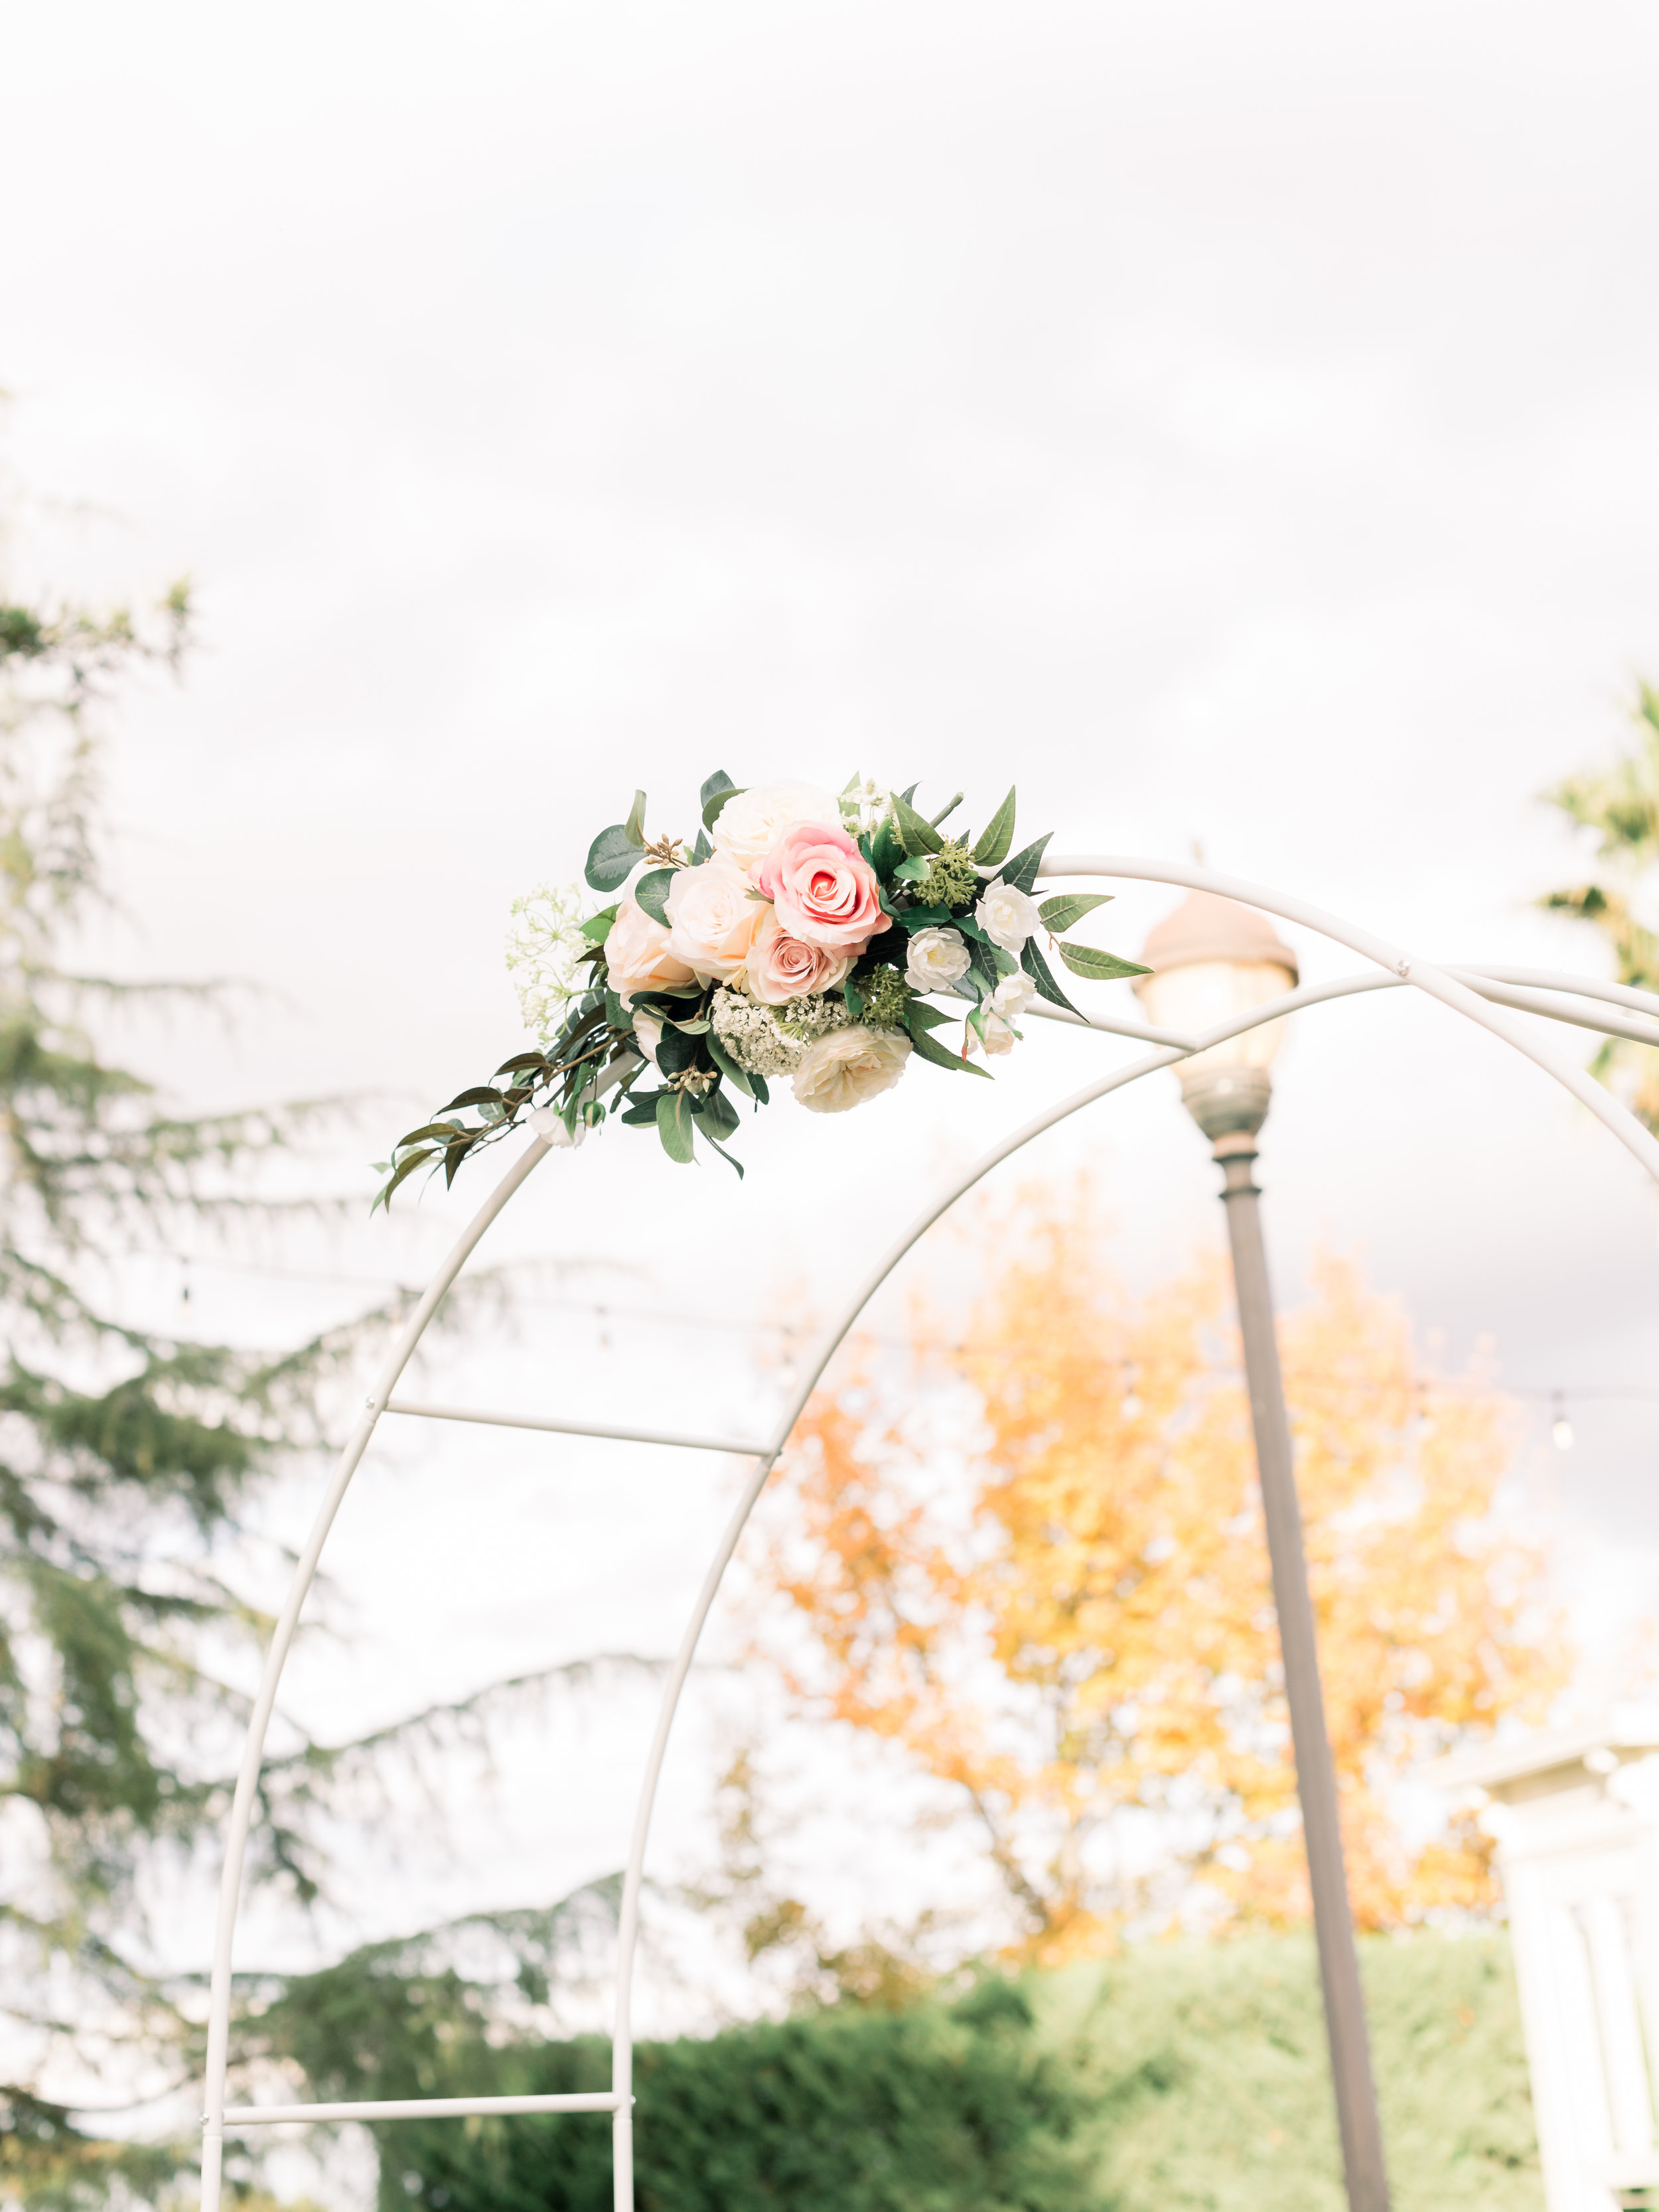 wedding-altar-with-flowers.jpg